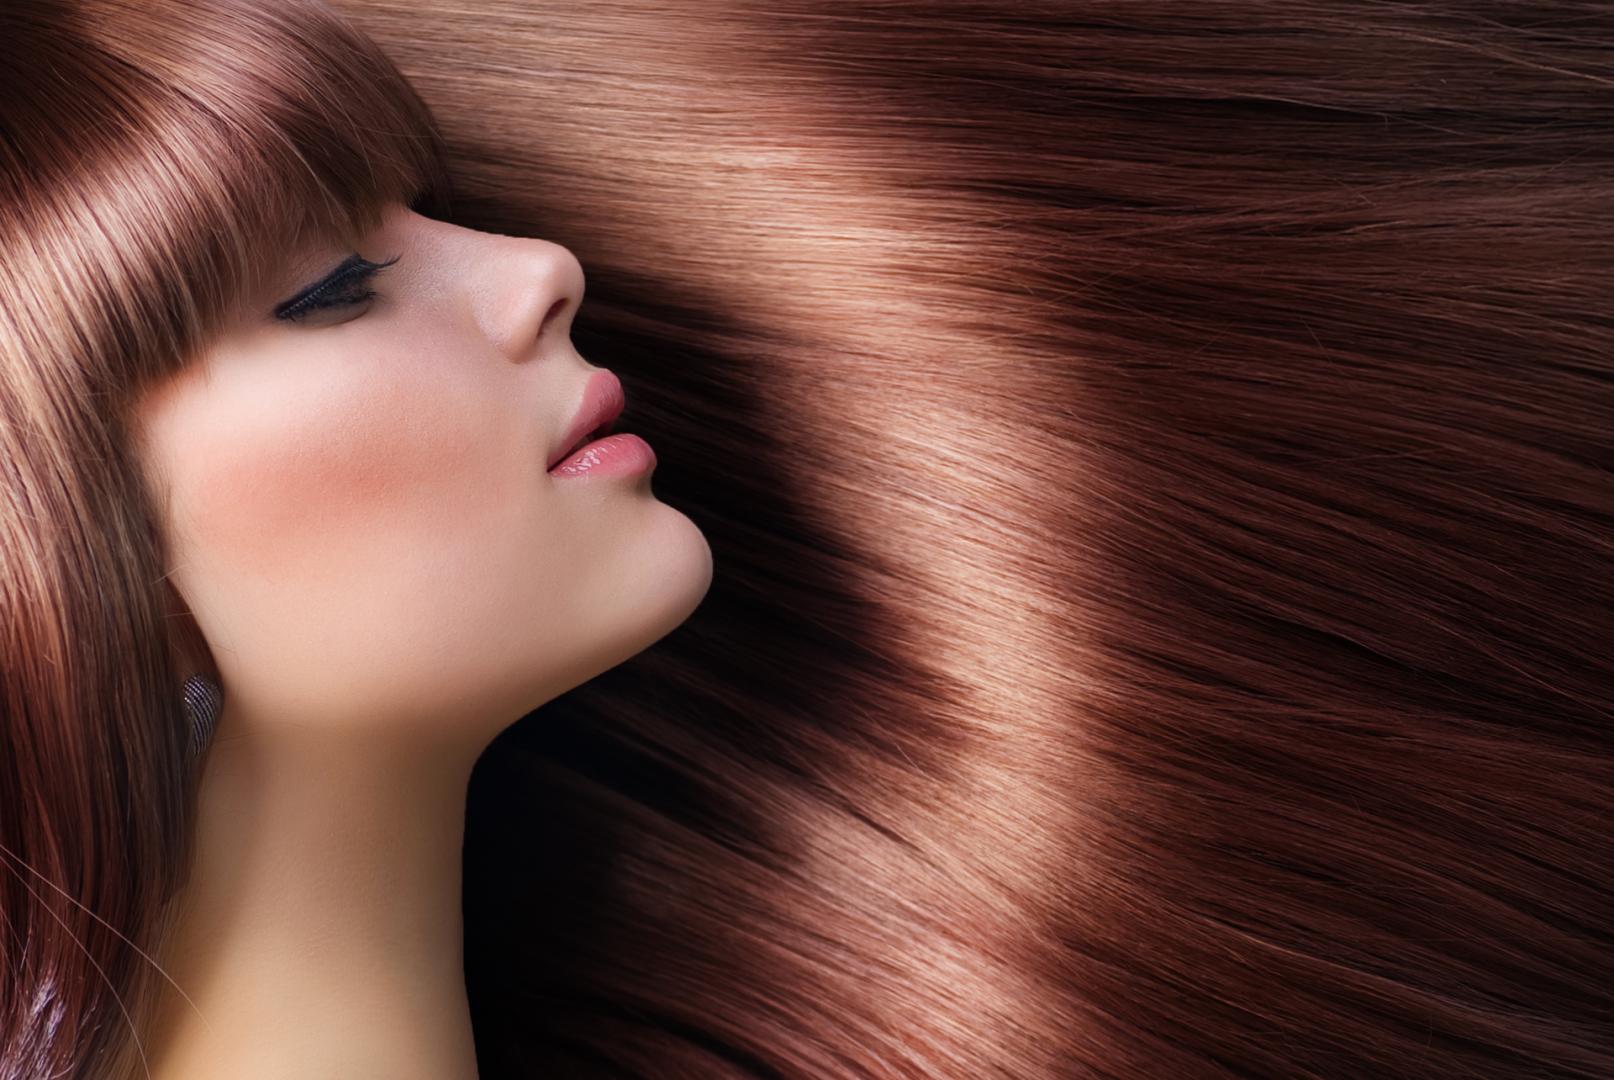 Coiffeur Visagiste Defrisage Beaune Salon Cut In